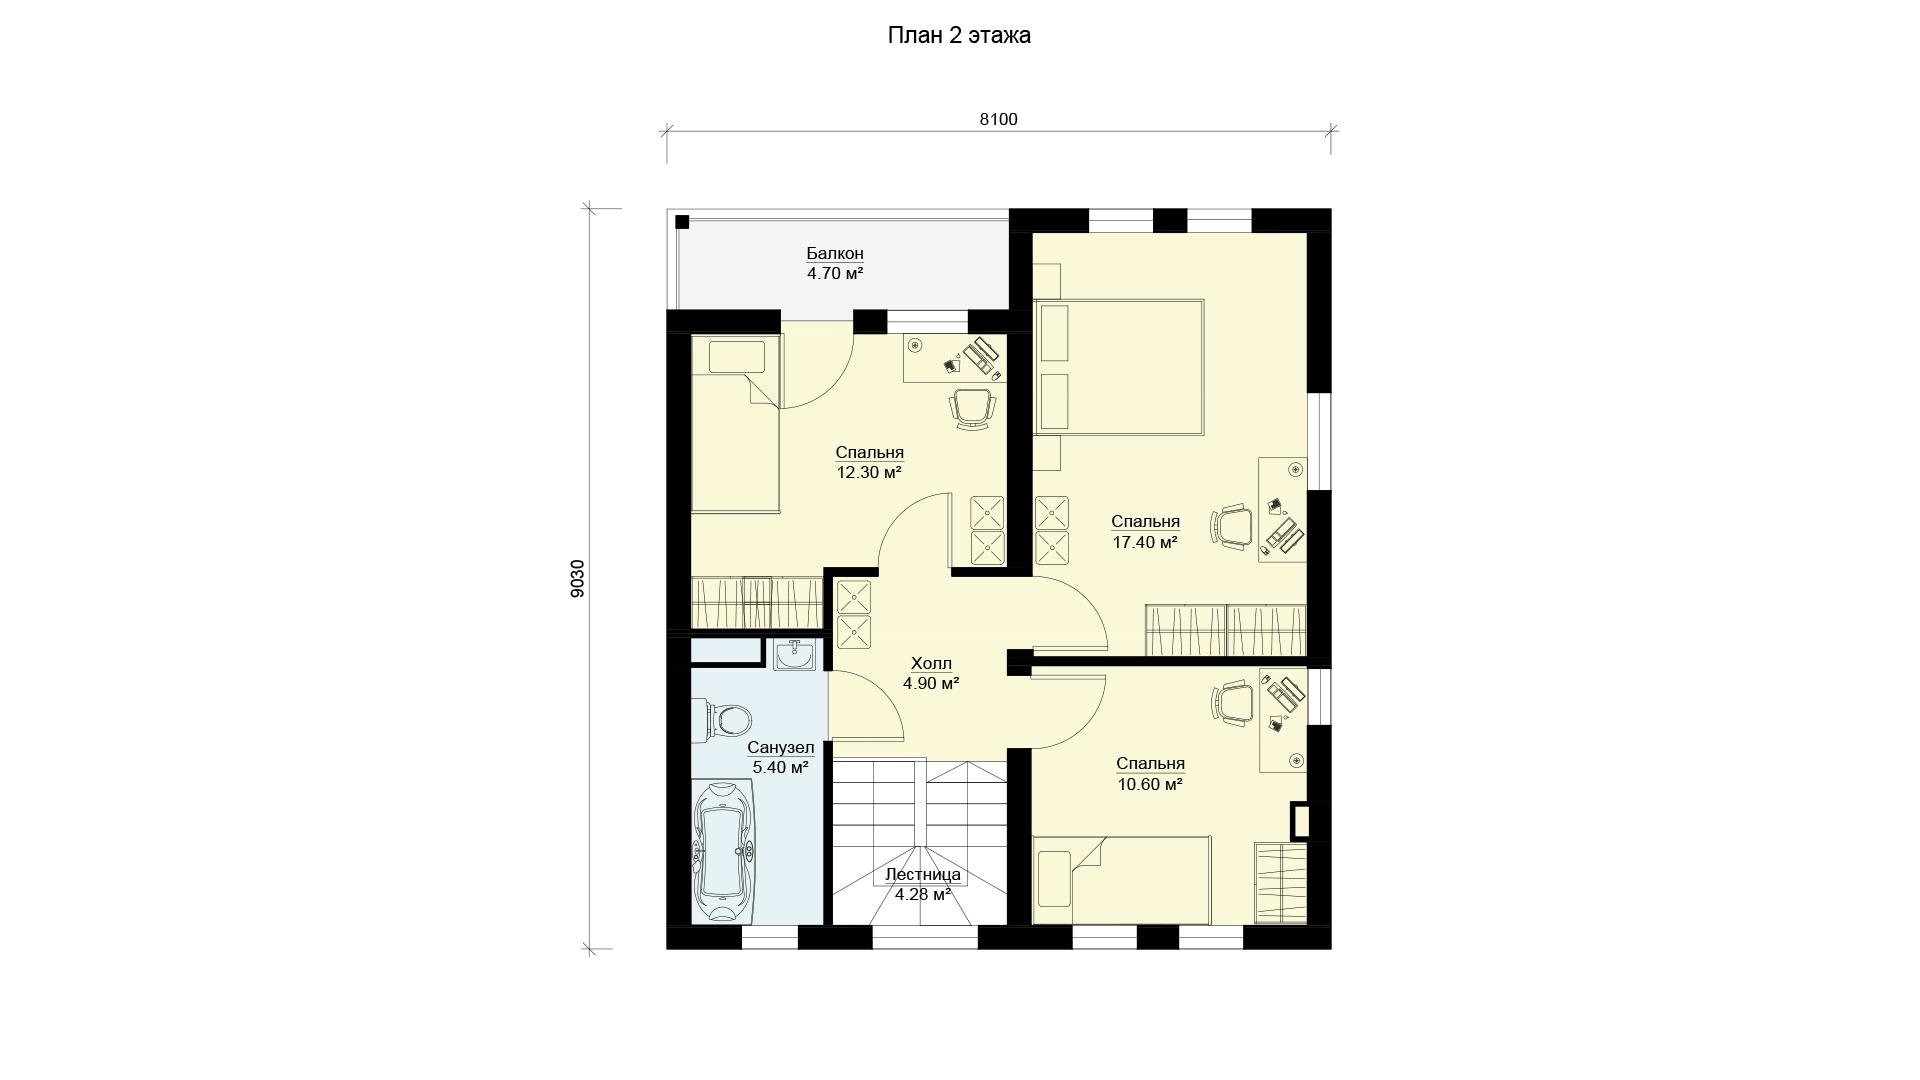 План второго этажа двухэтажного дома, проект БЭНПАН МС-146/1.